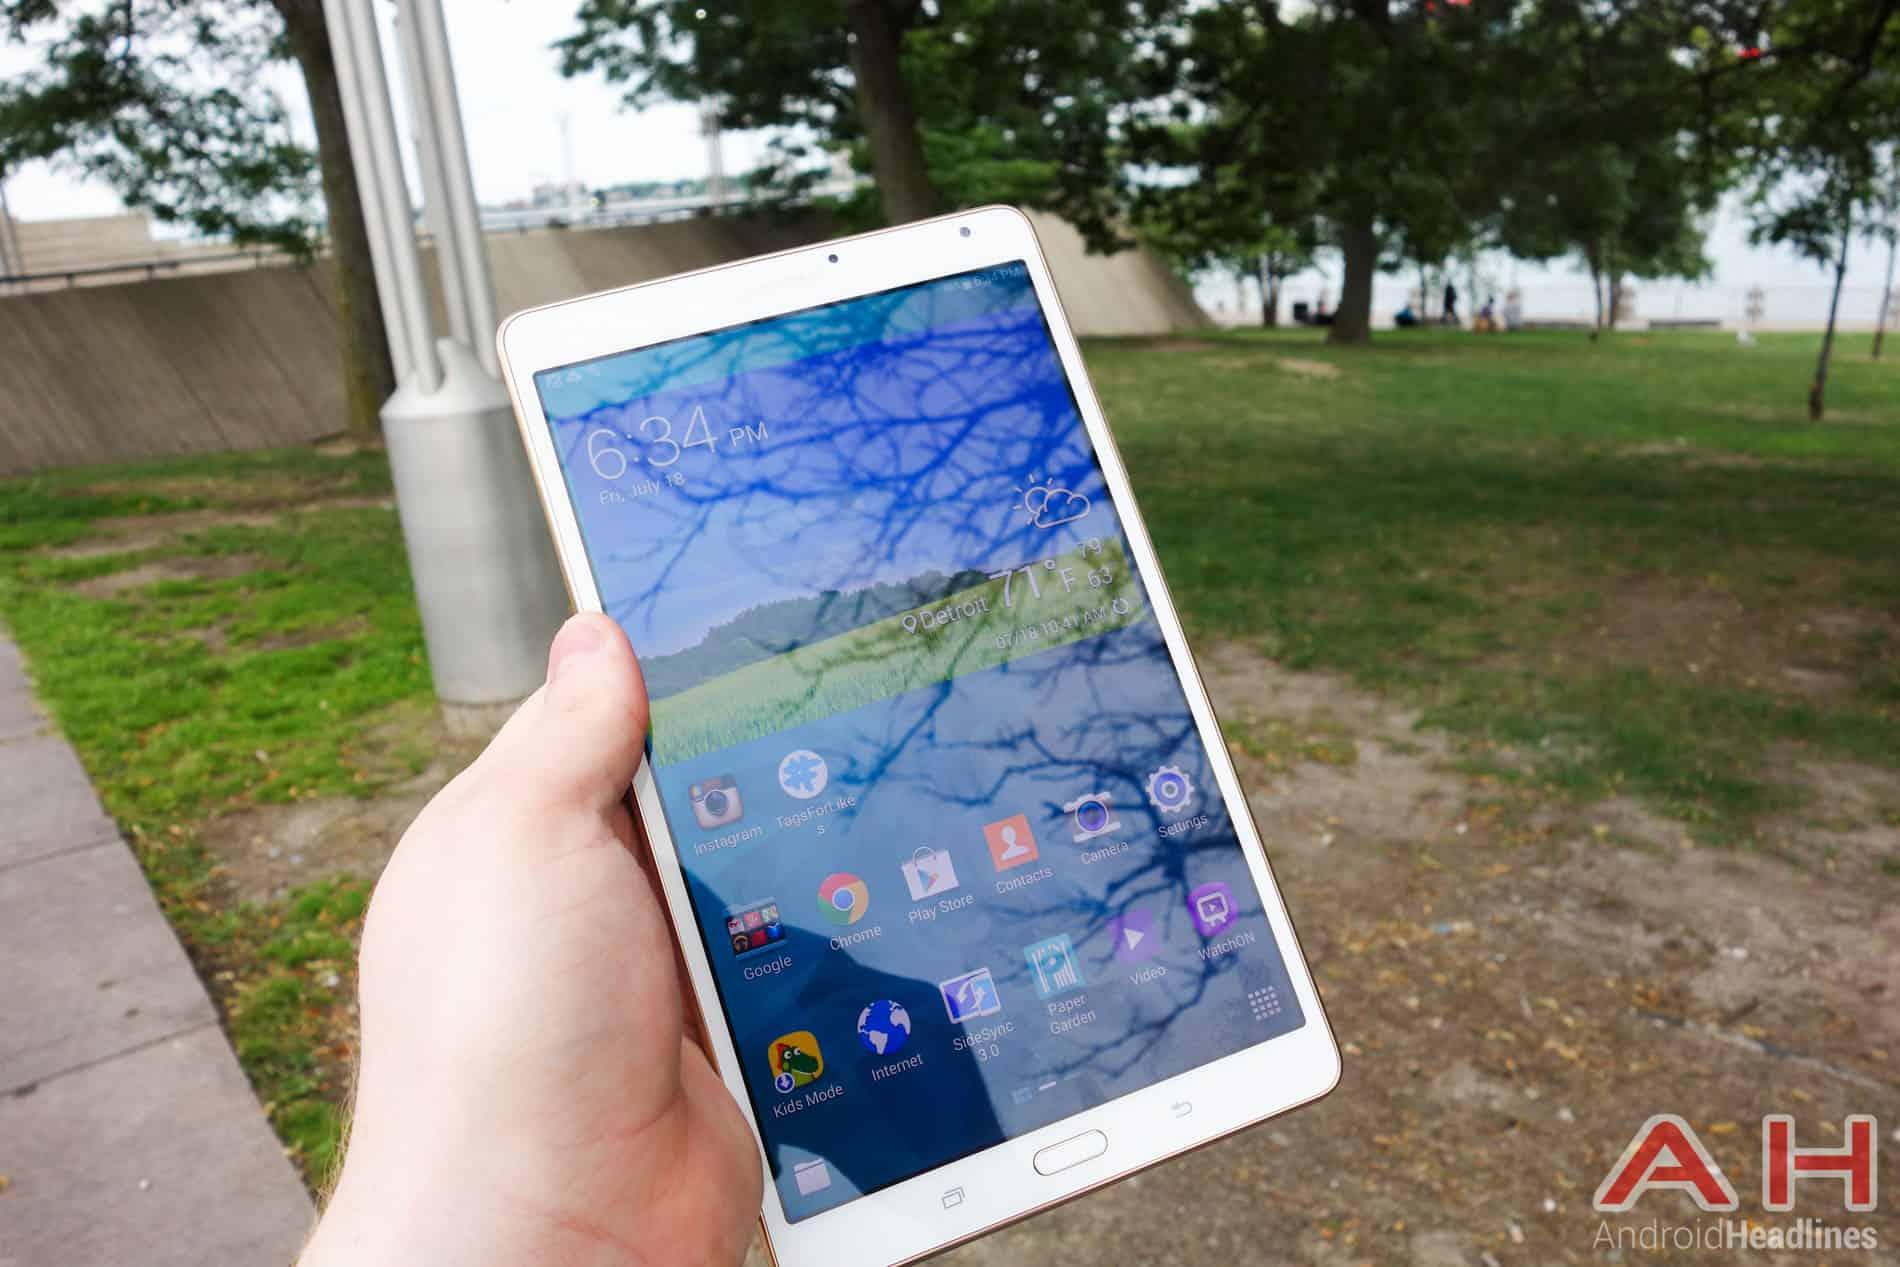 Samsung Galaxy Tab S AH 4 2